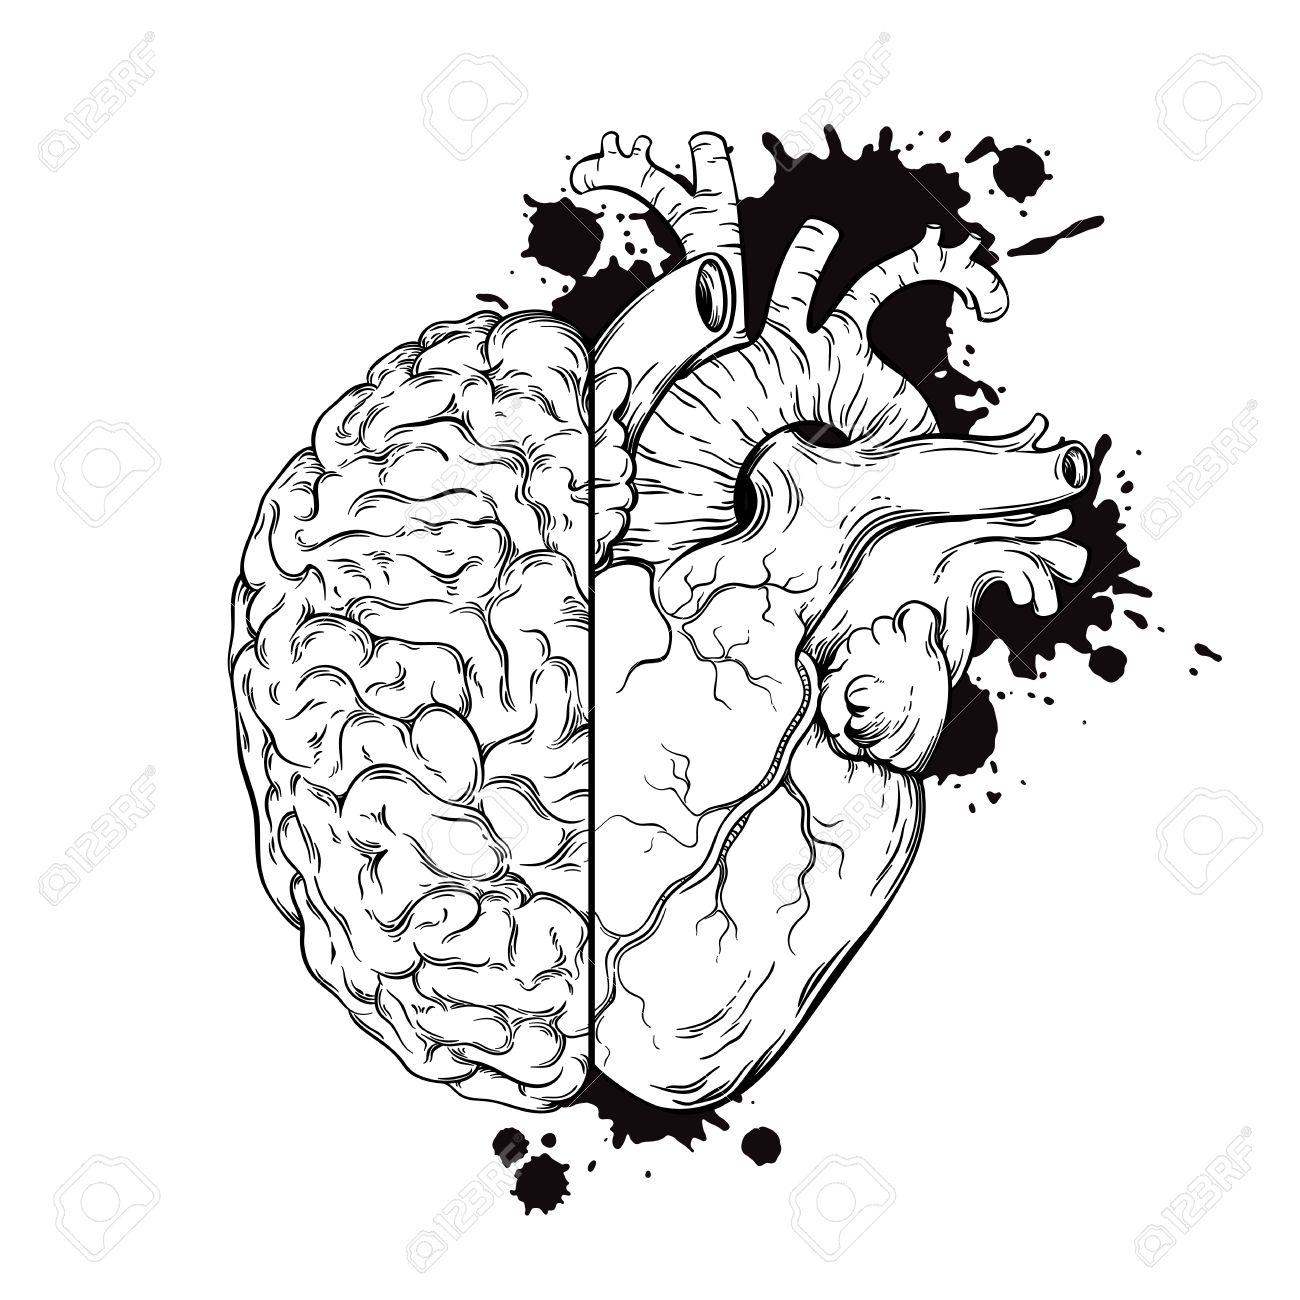 1300x1300 Hand Drawn Line Art Human Brain And Heart Halfs. Grunge Sketch